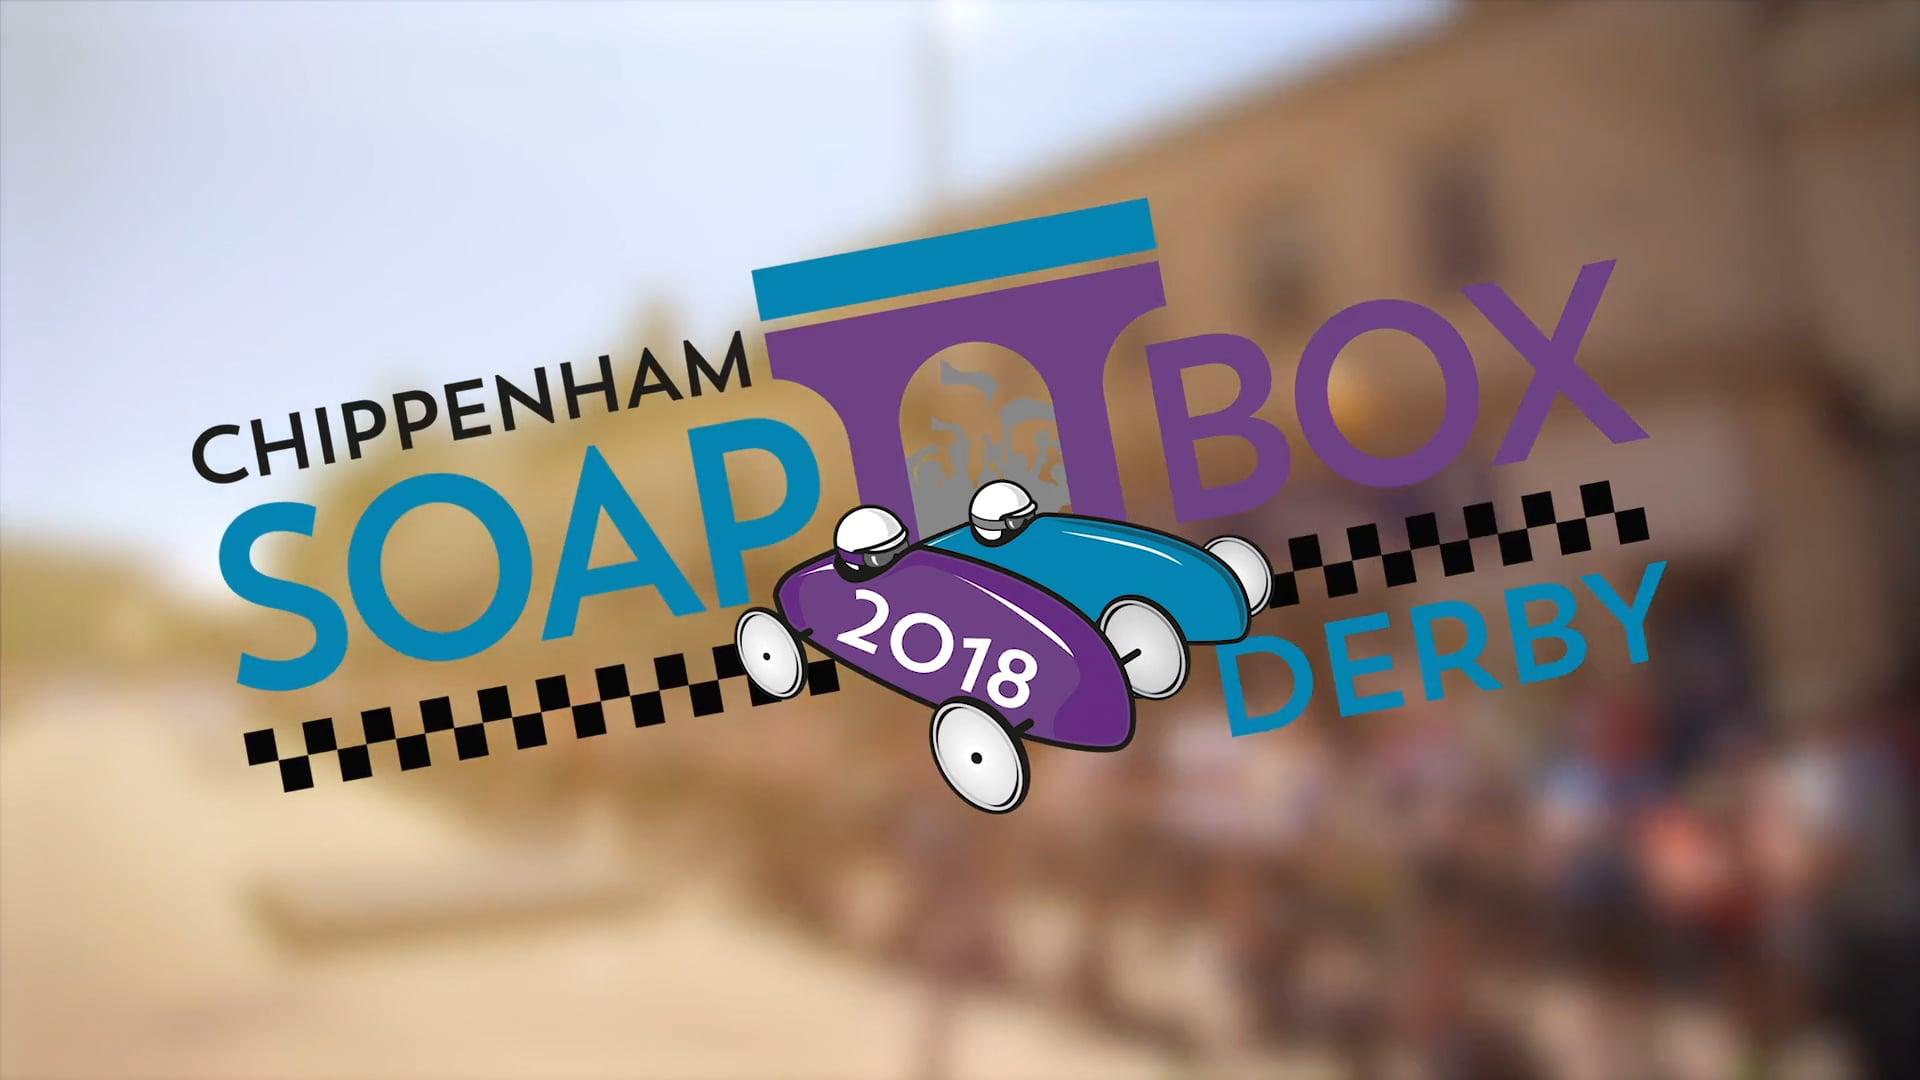 Chippenham Soap Box Derby